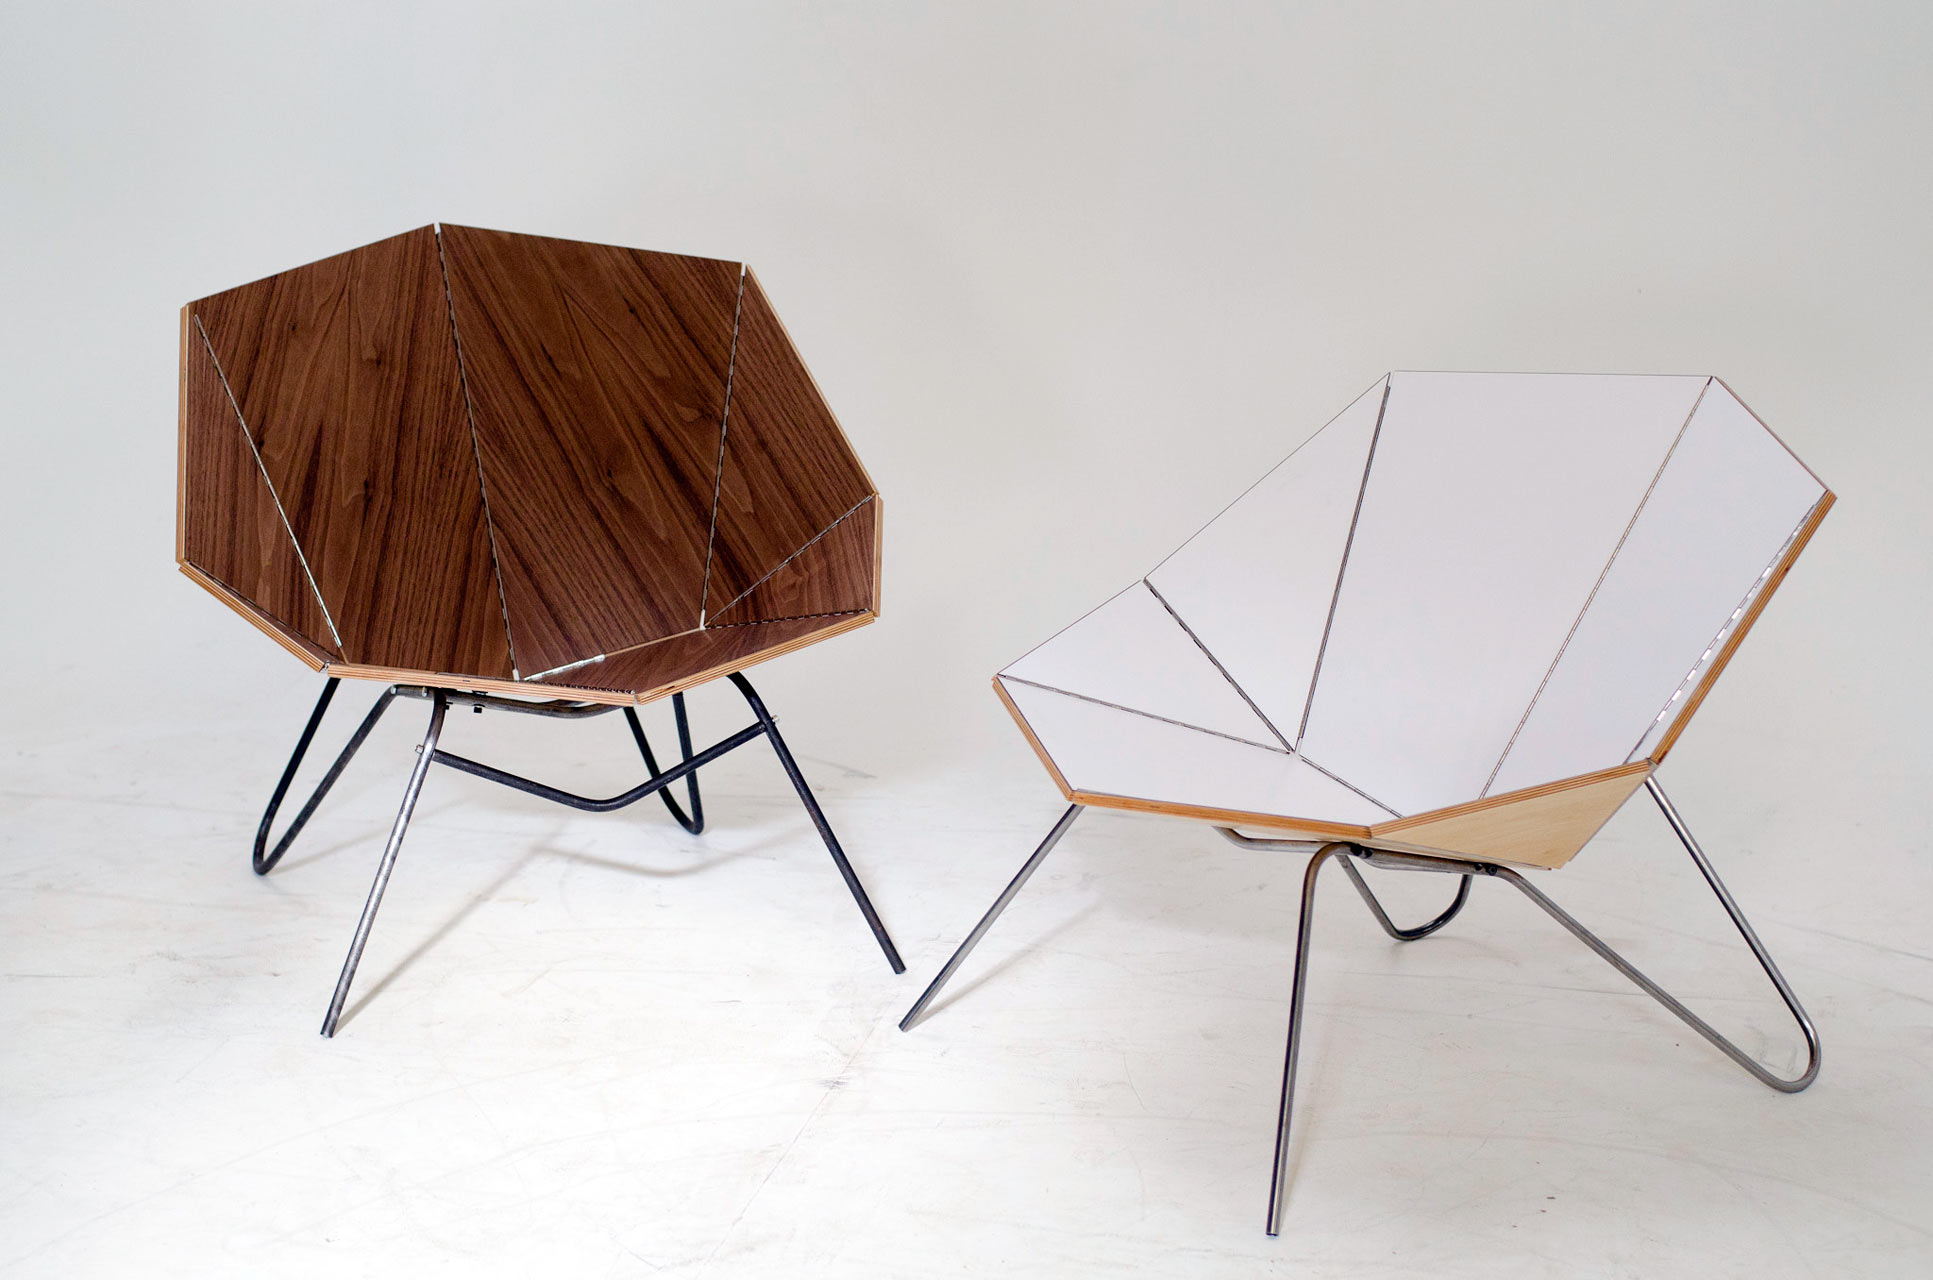 Cut & Fold: Modern, Origami-Like Furniture